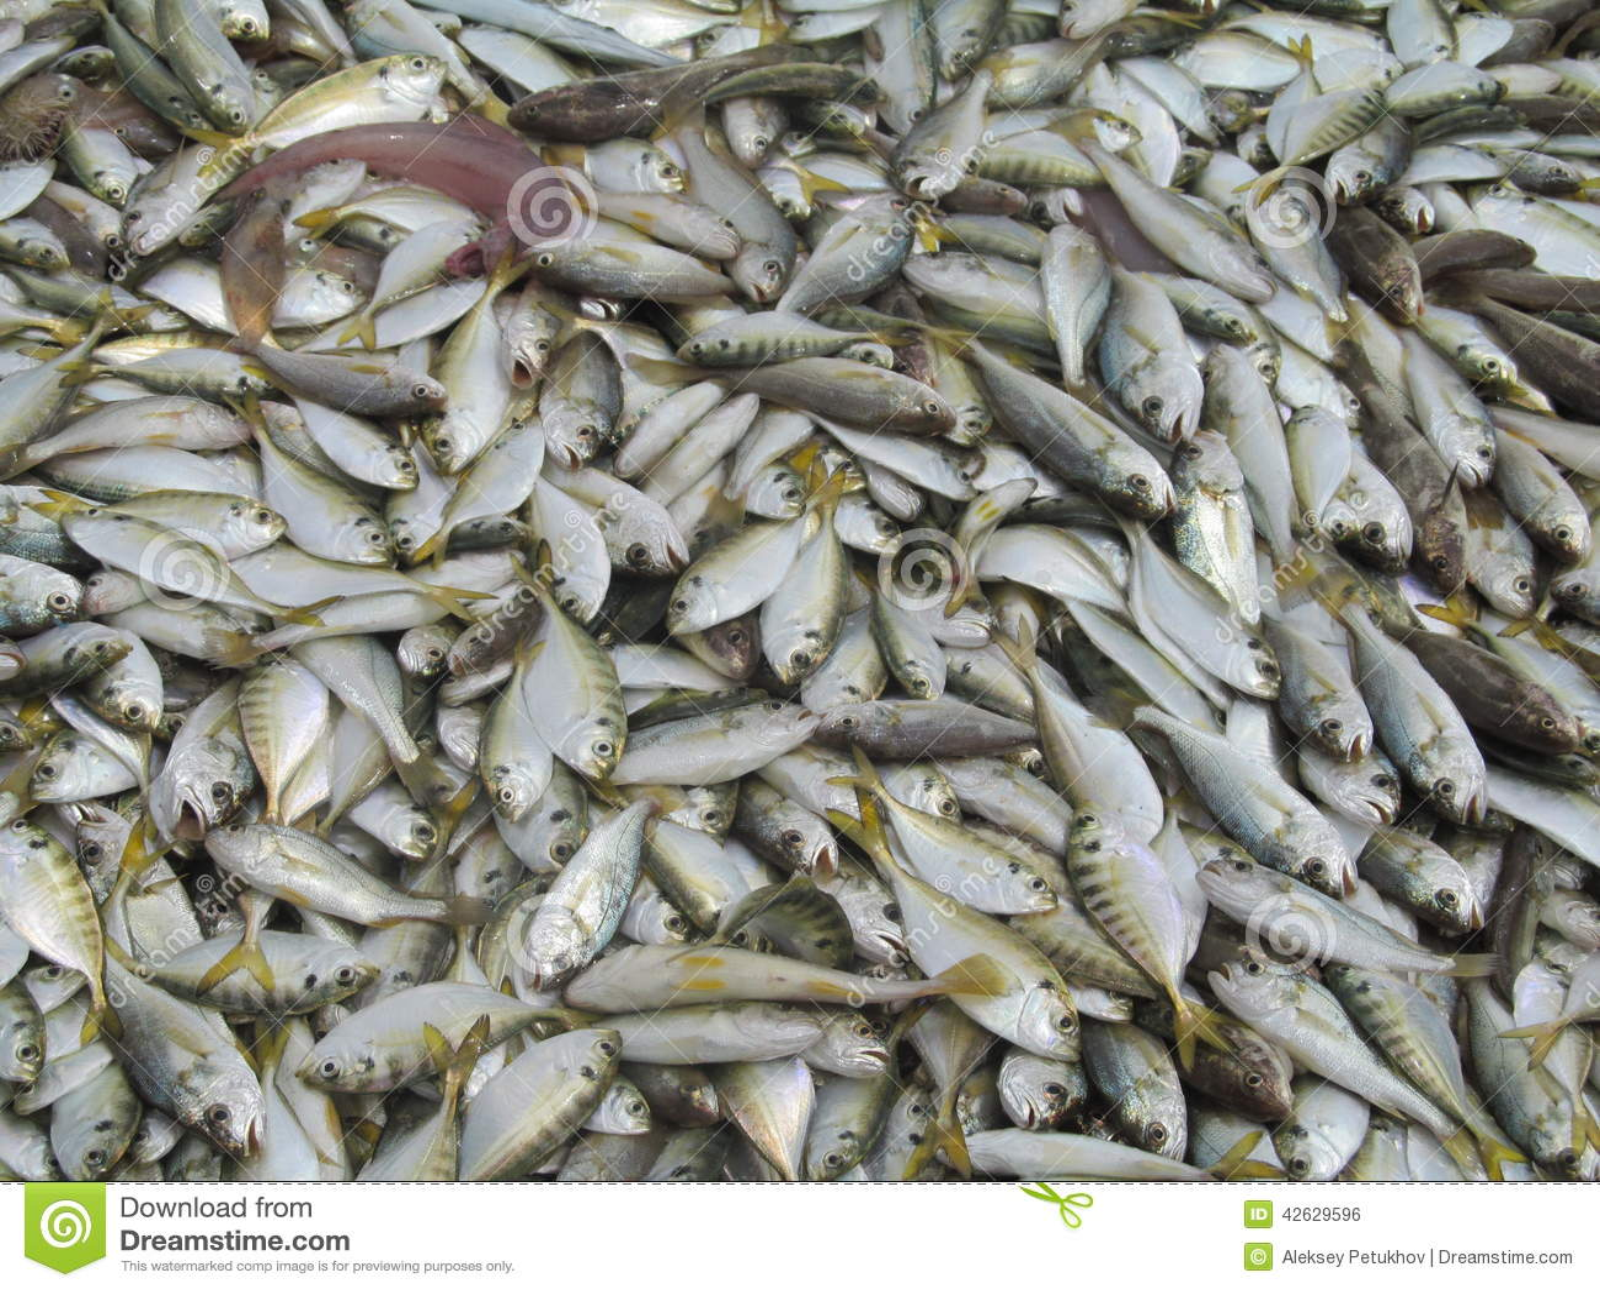 Fish sea ocean vietnam asia fishing catch stock photo for Fish in vietnam